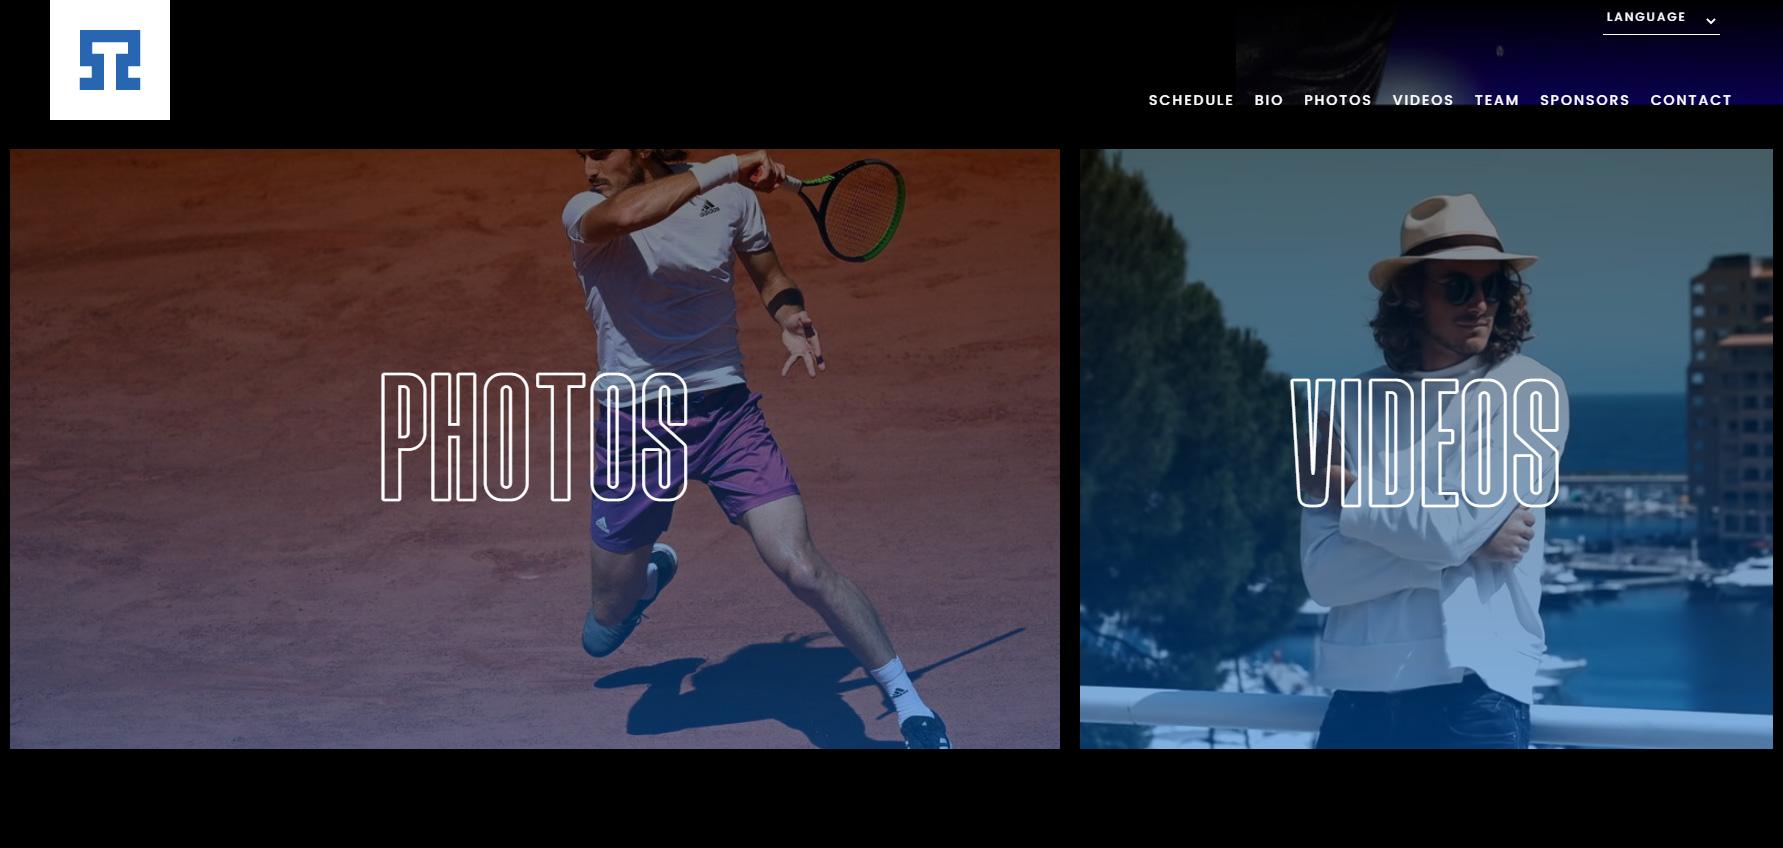 Stefanos Tsitsipas - Website of the Day